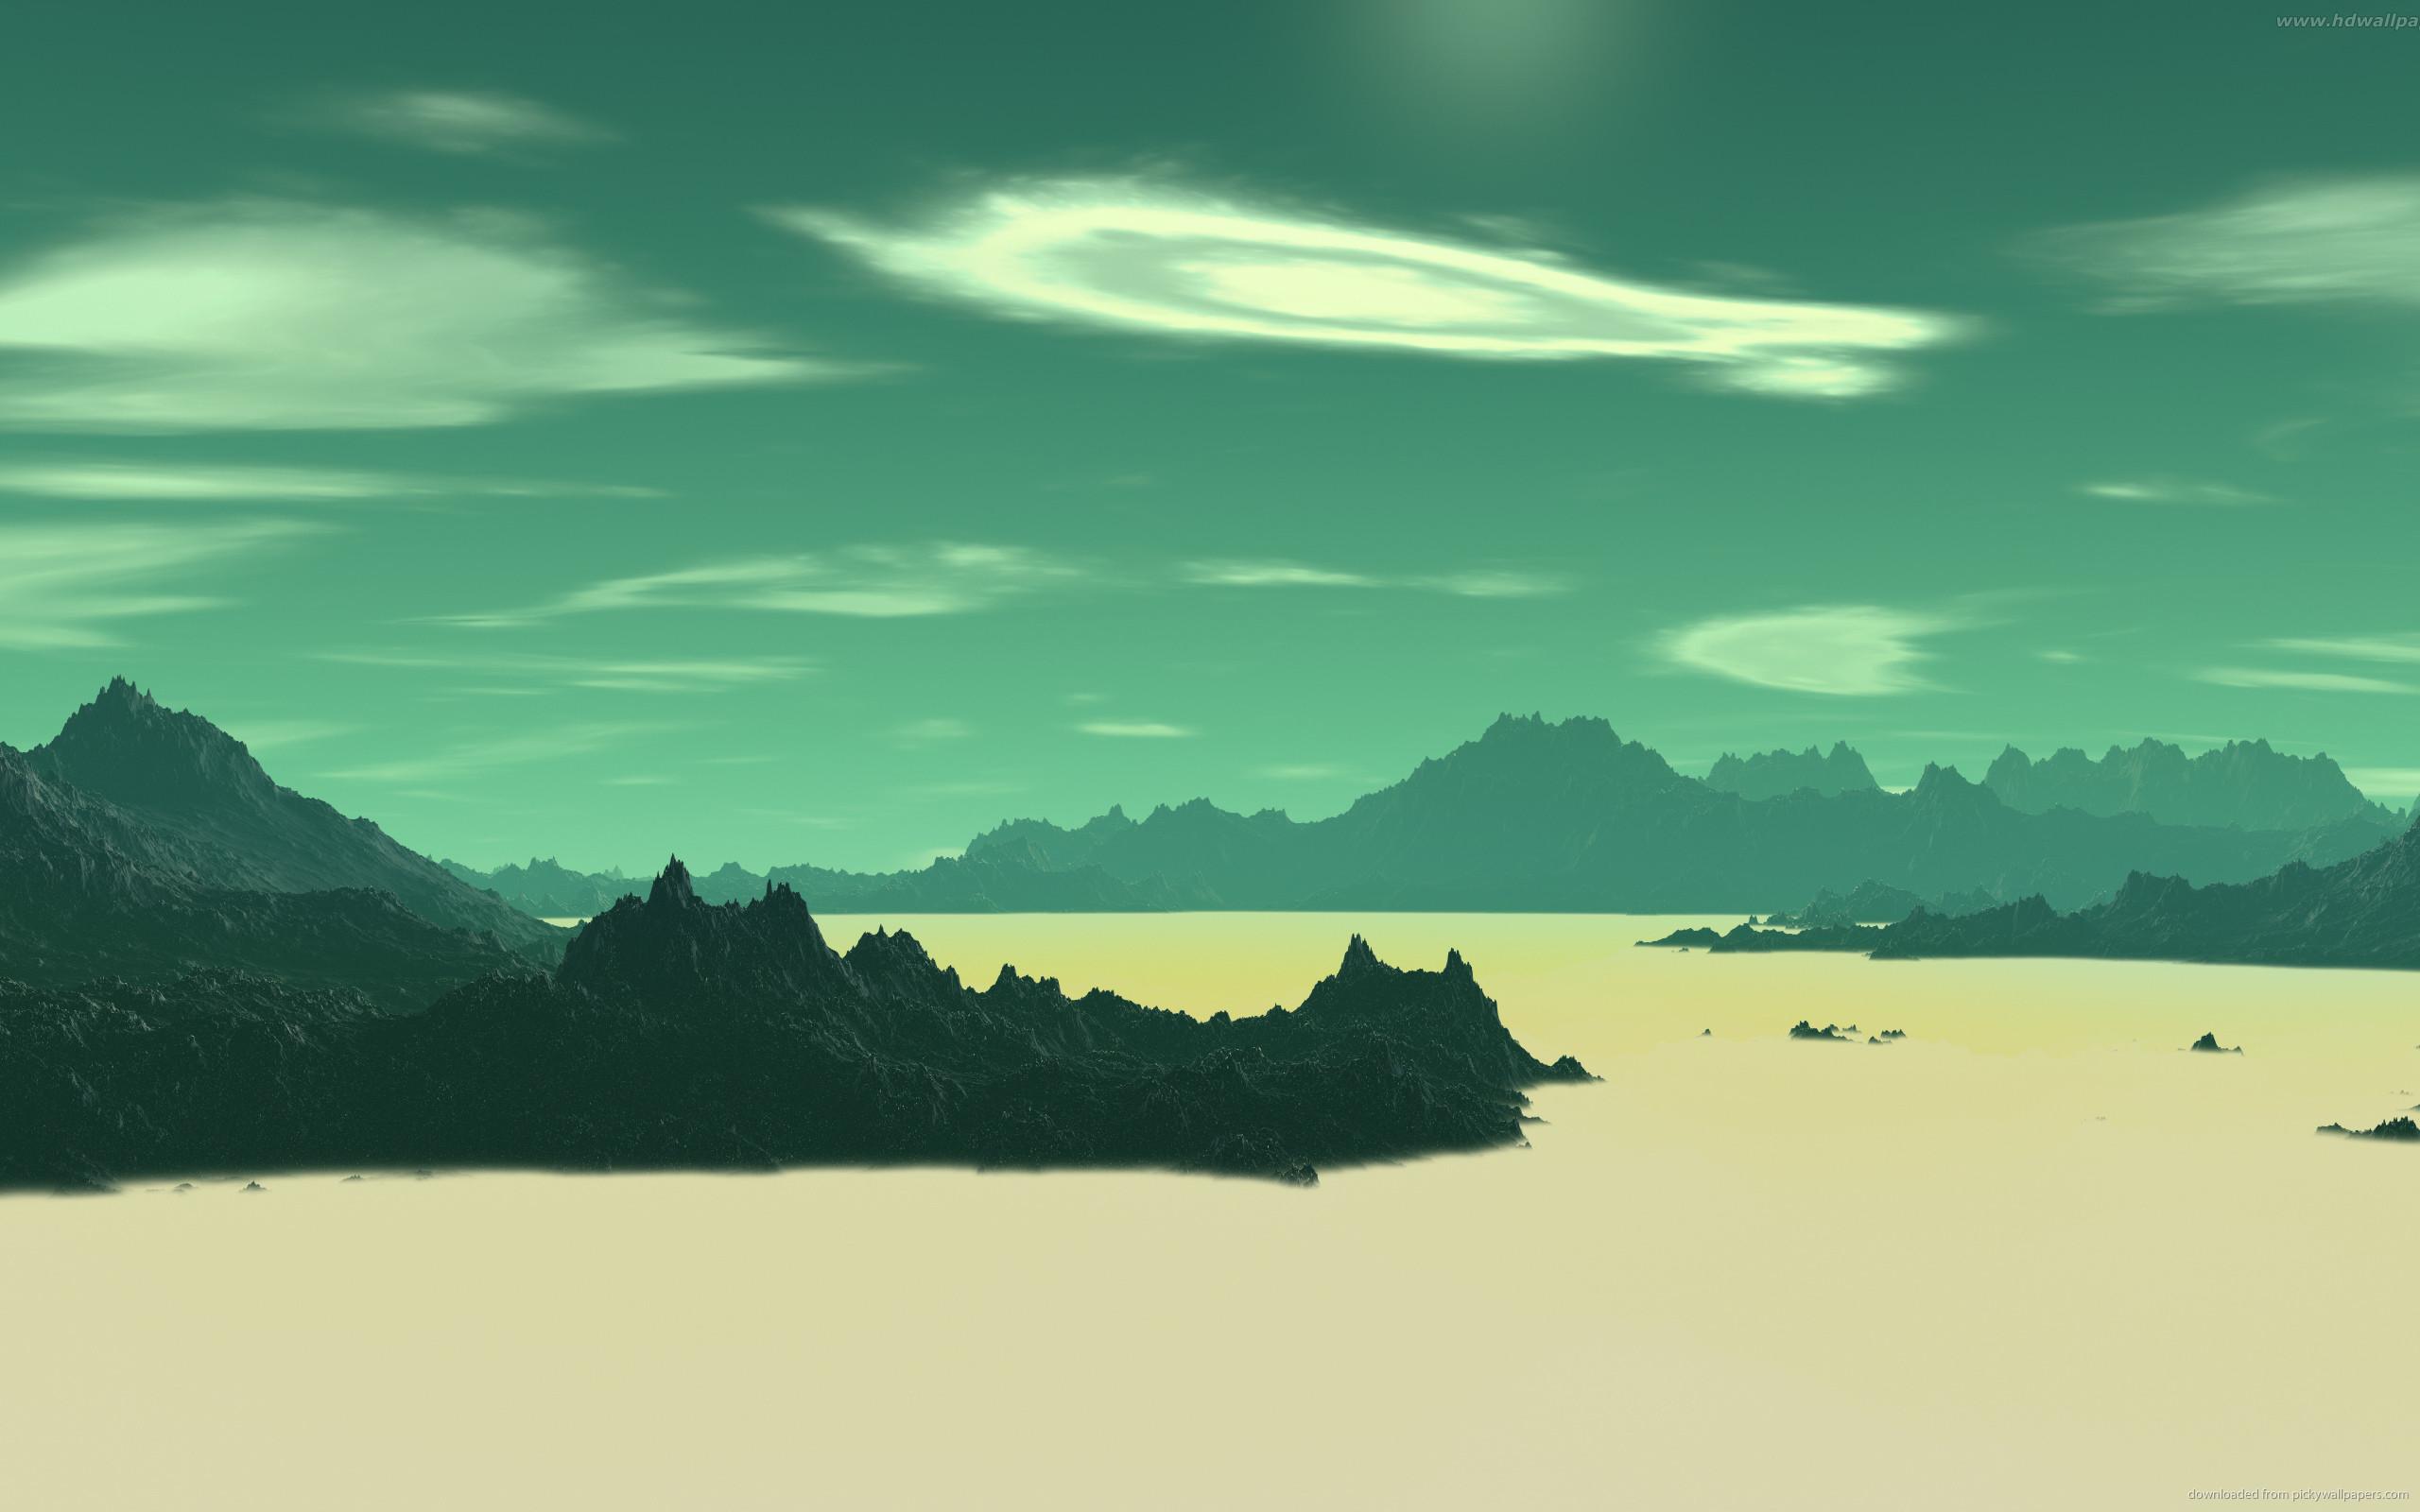 Sci-fi landscapes alien planetscape wallpaper | | 118295 |  WallpaperUP